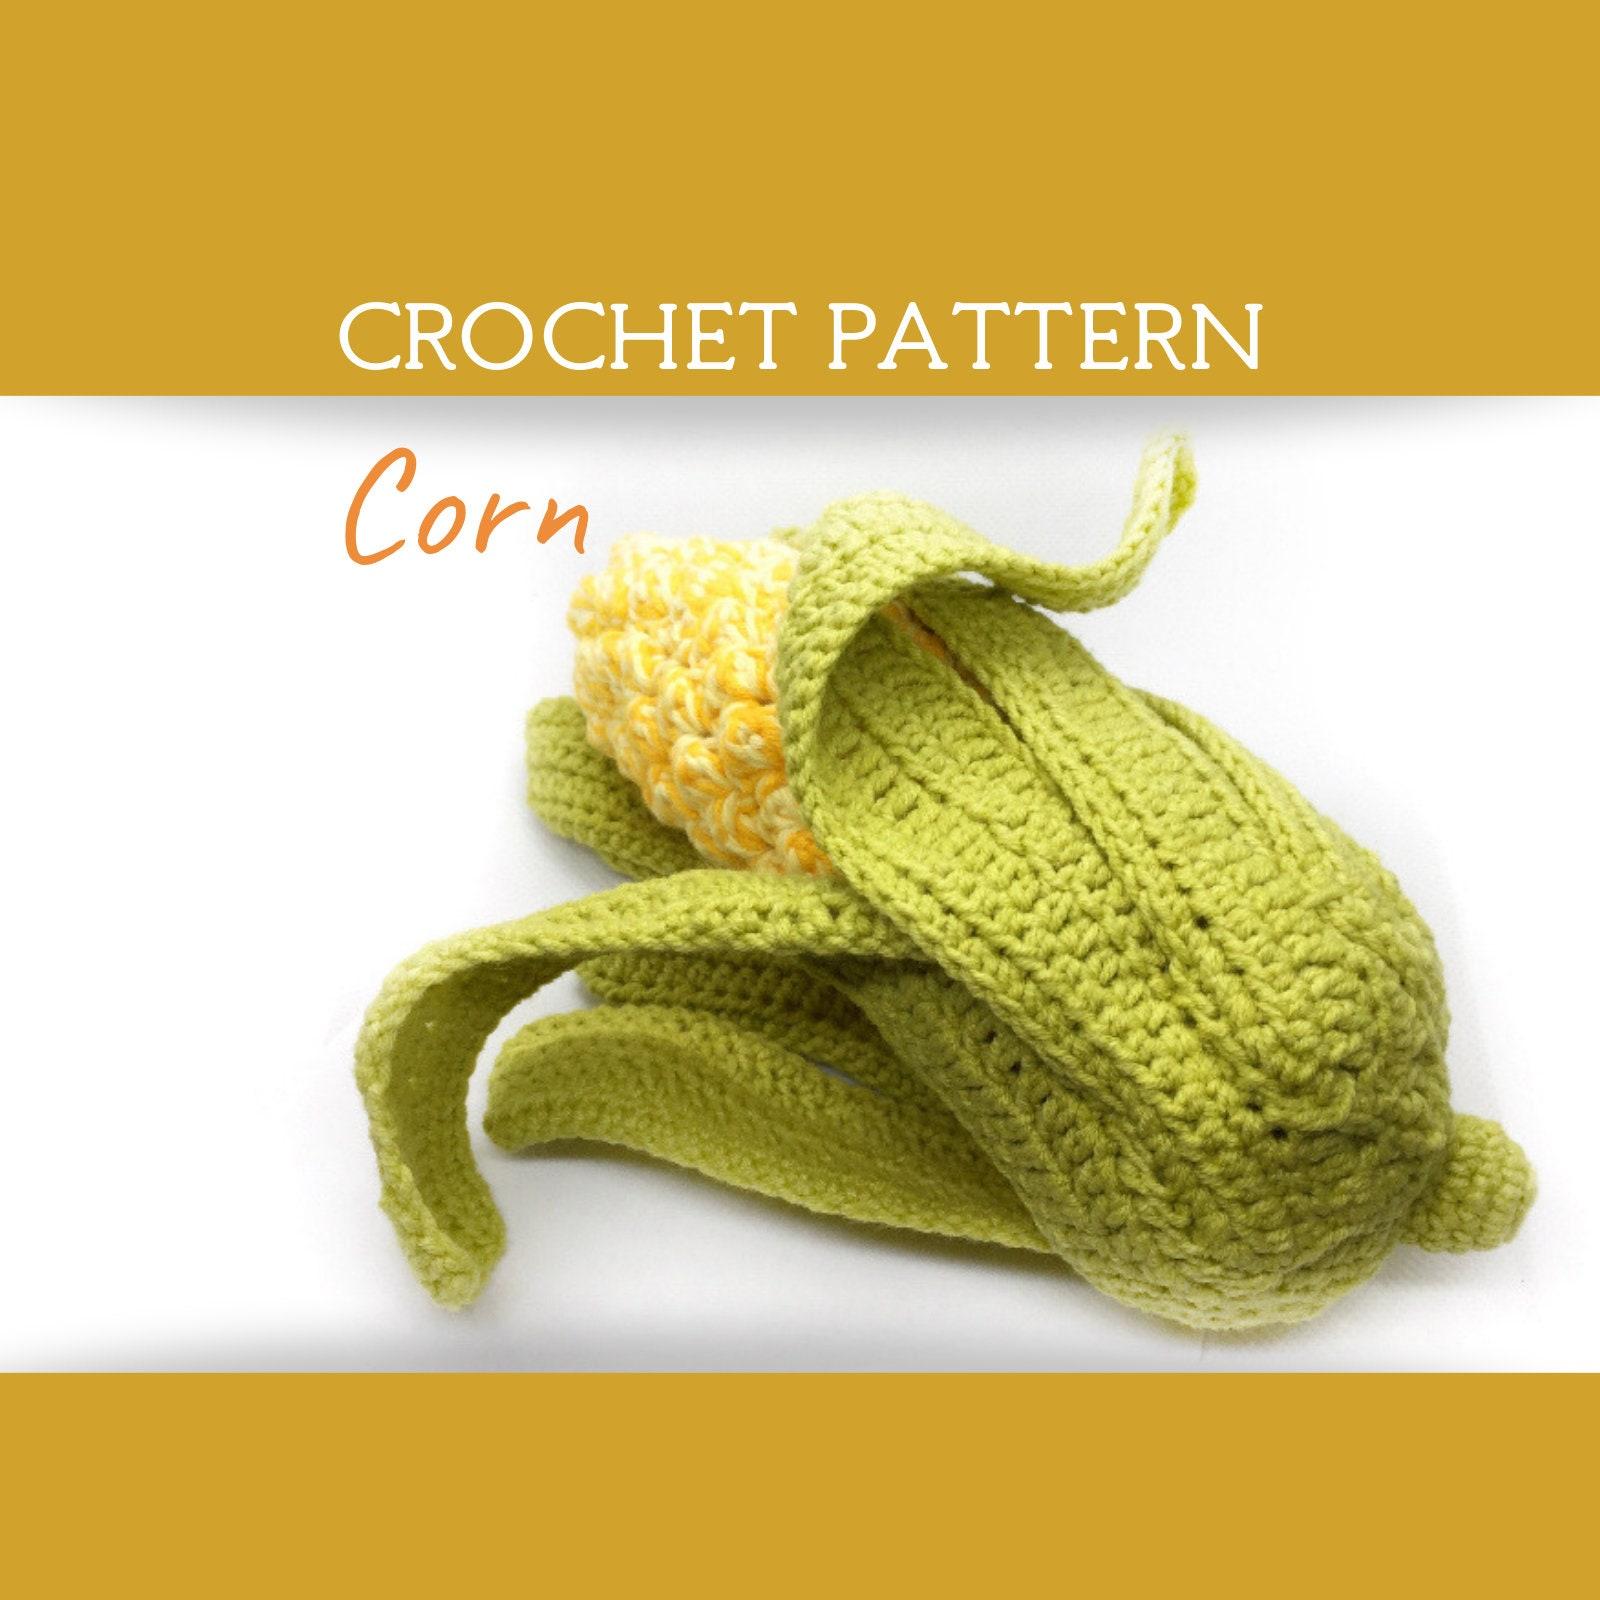 GREEN PEAS - Crochet Peas Amigurumi Pattern - Crochet Vegetables ... | 1600x1600